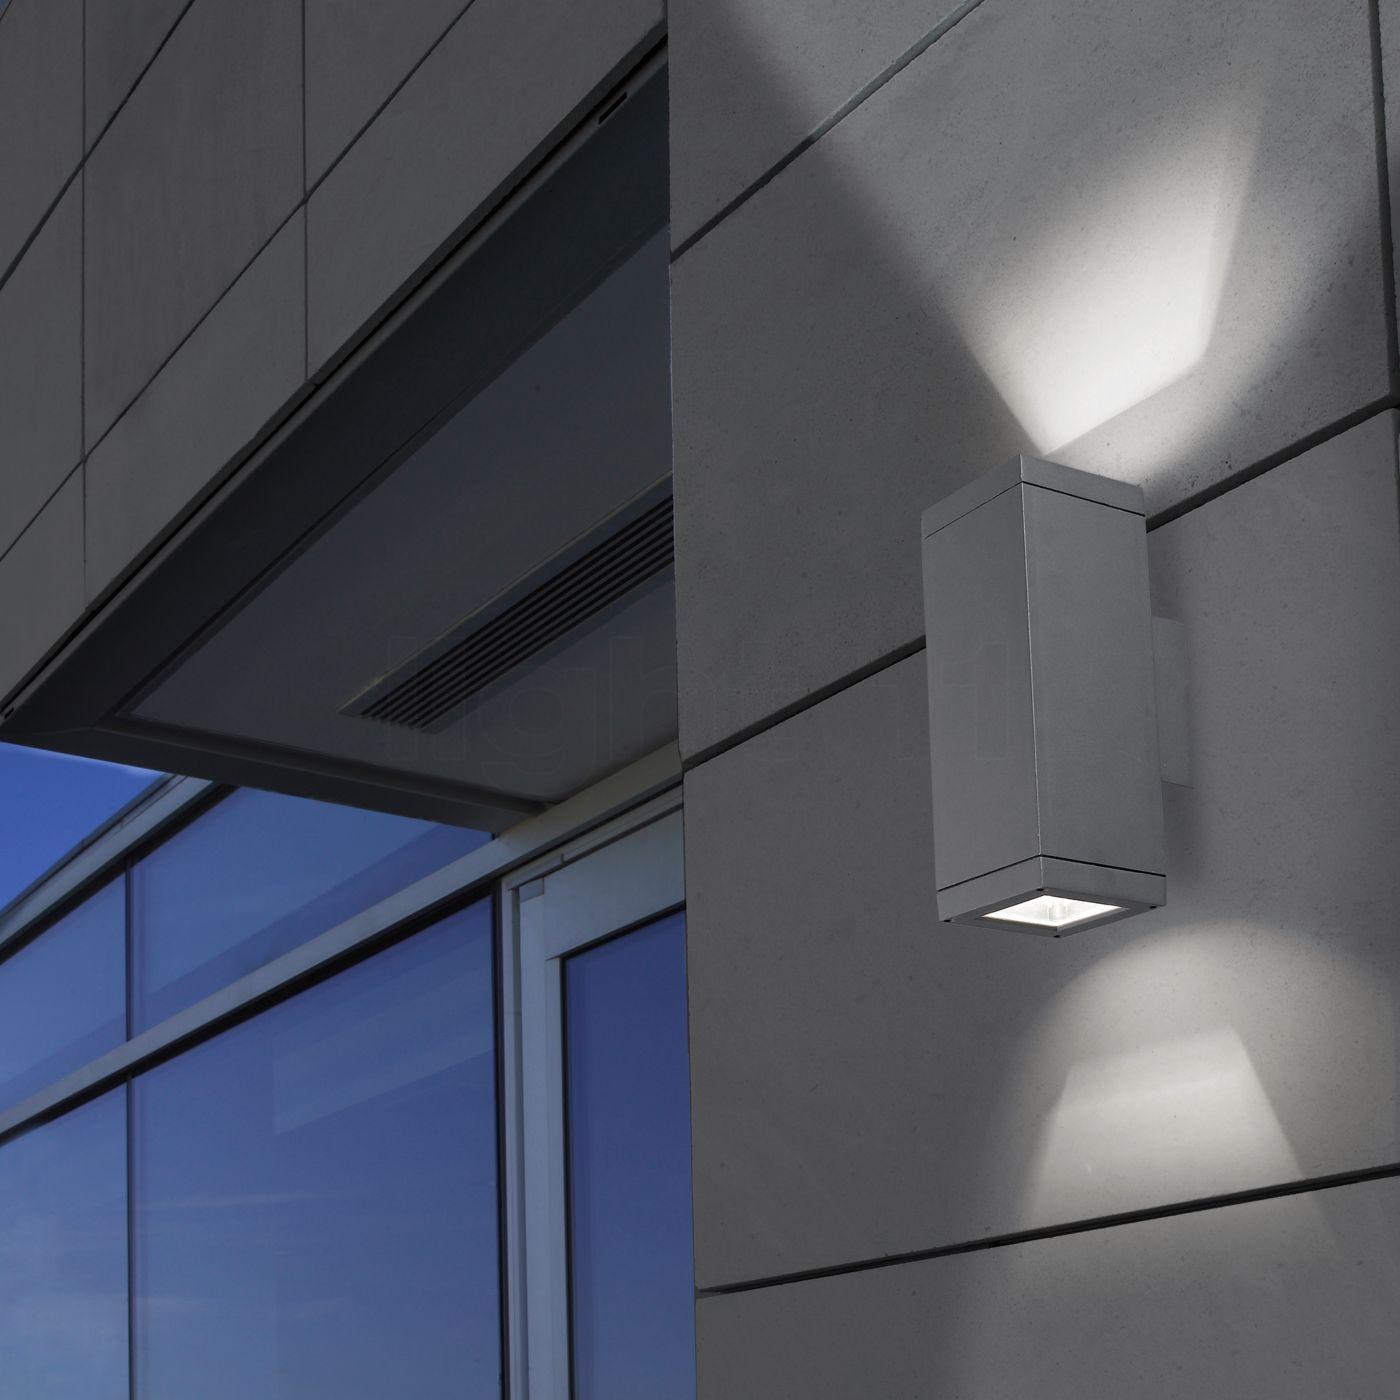 up down wall light contemporary buy ledsc4 afrodita par30 updown wall light at